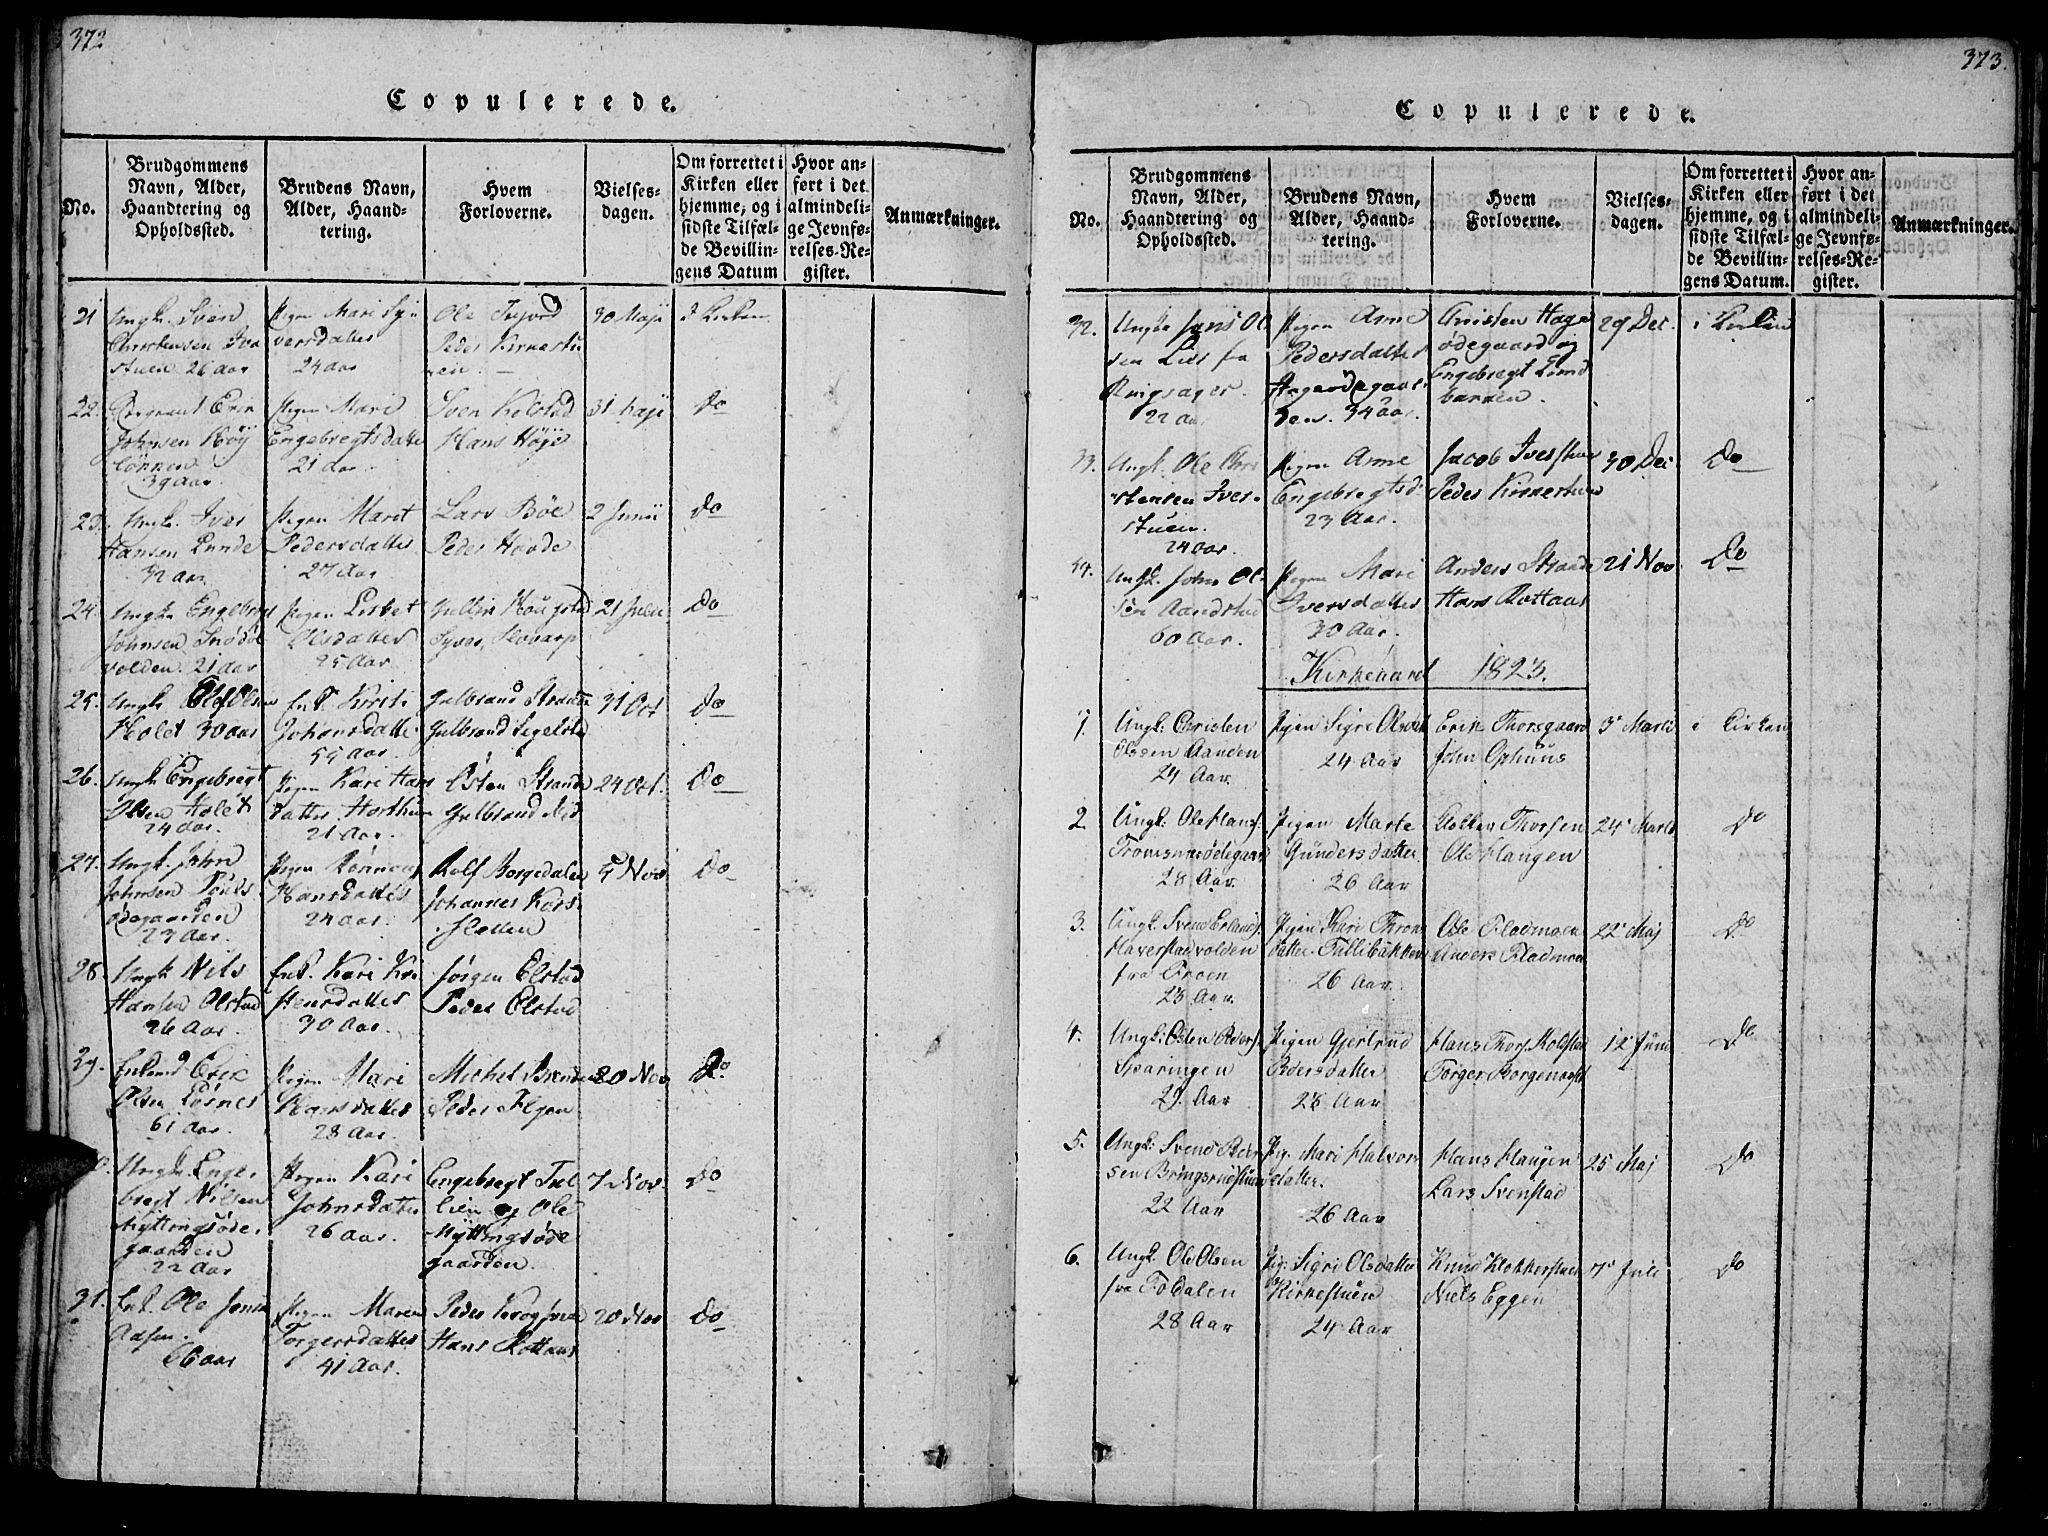 SAH, Ringebu prestekontor, Ministerialbok nr. 4, 1821-1839, s. 372-373